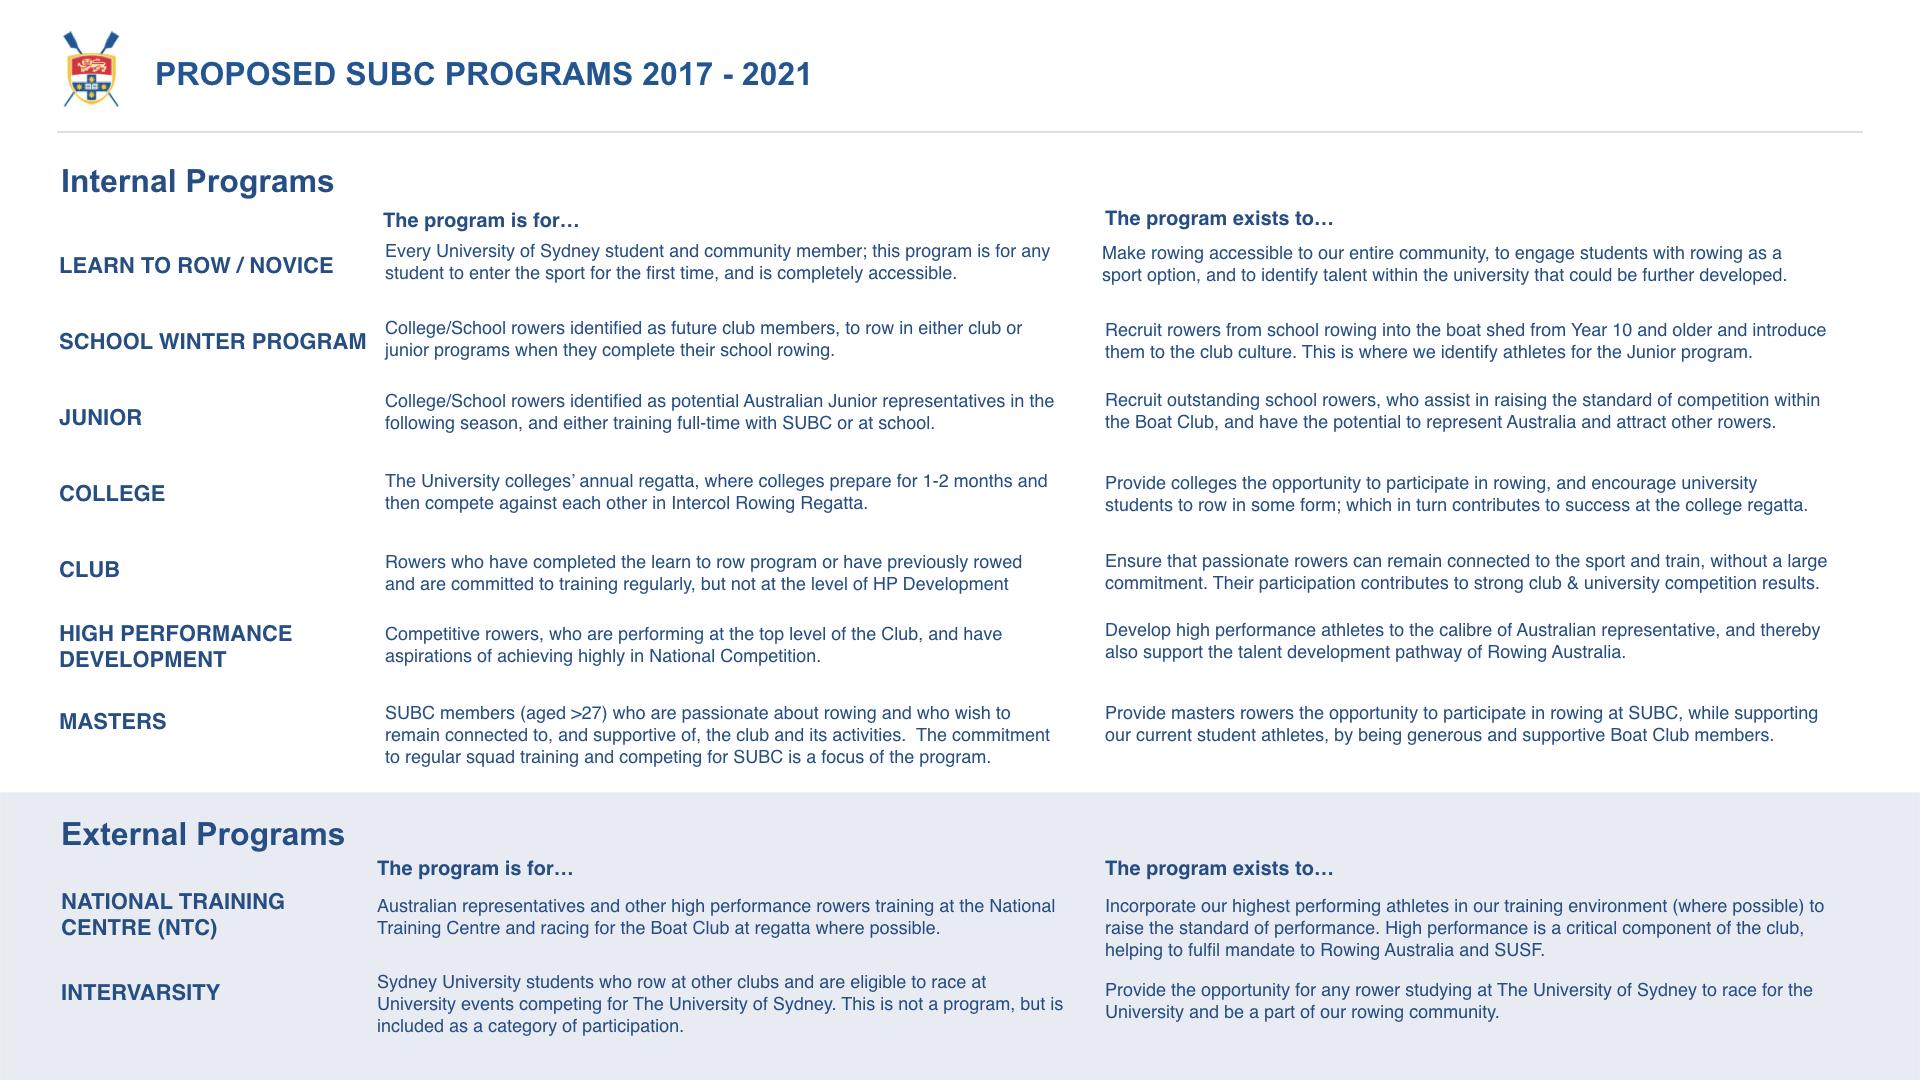 SUBC Strategic Plan 2017 Members Version.012.jpg